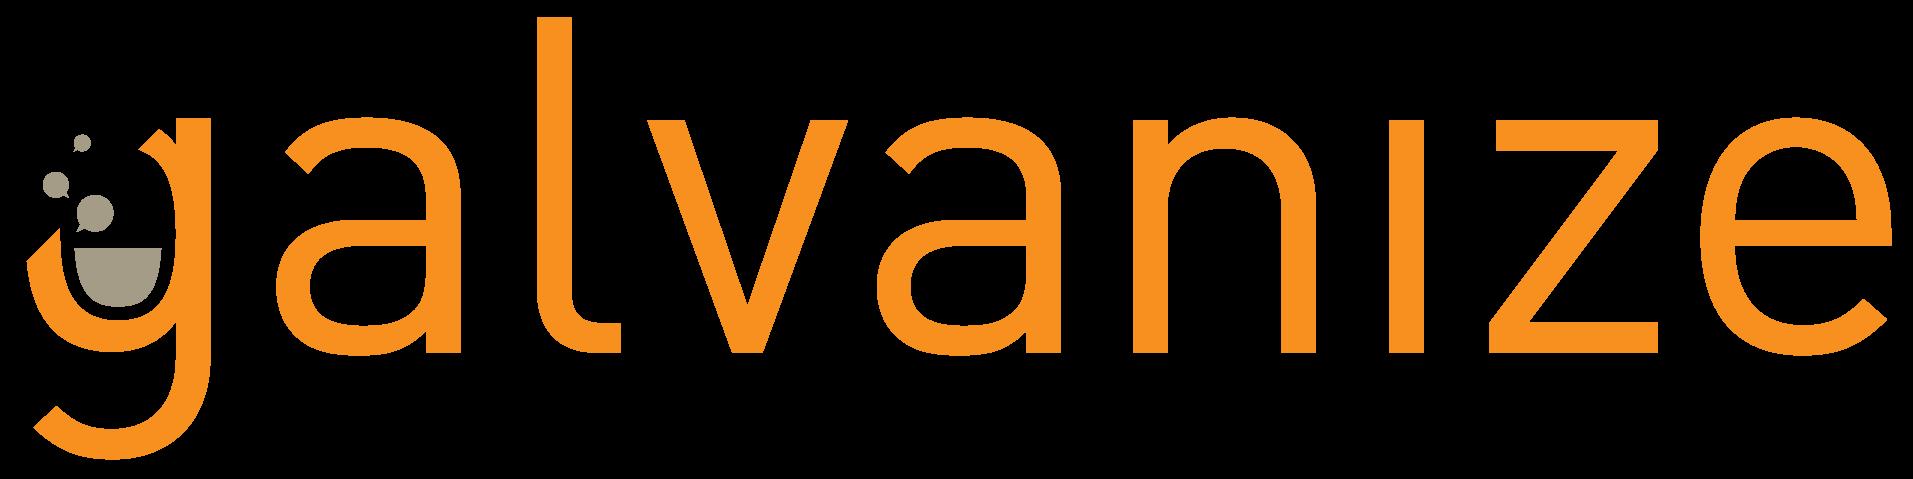 Galvanize-Galvanize-logo